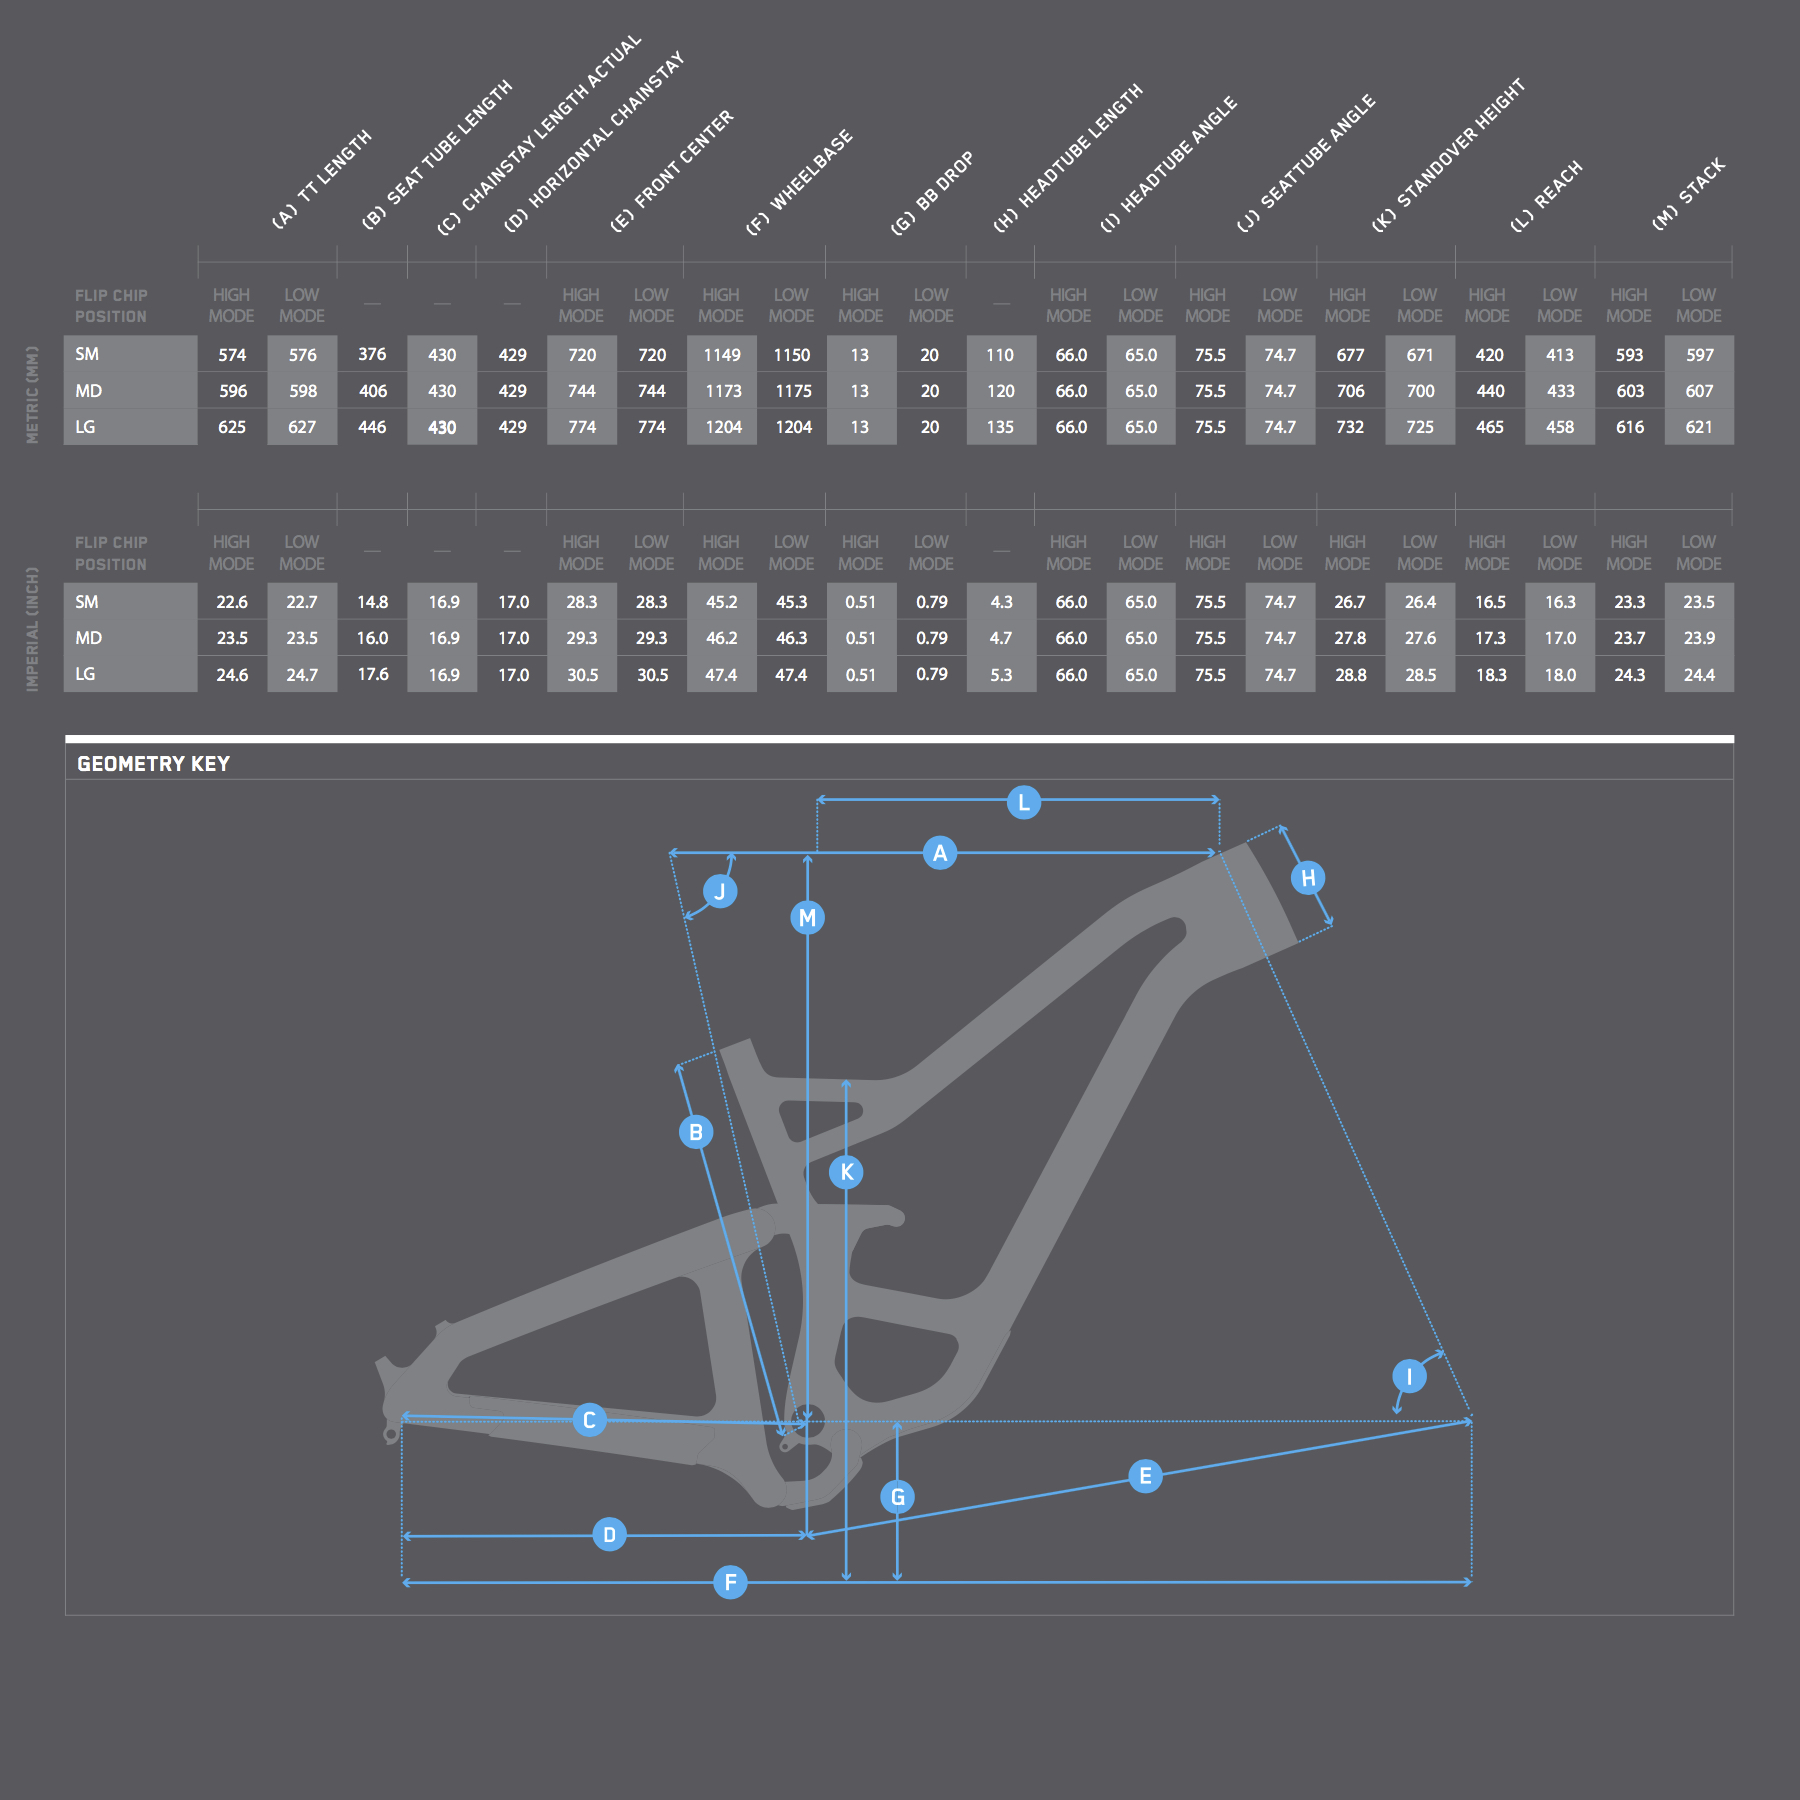 Niner RIP 9 RDO 27.5 geometry